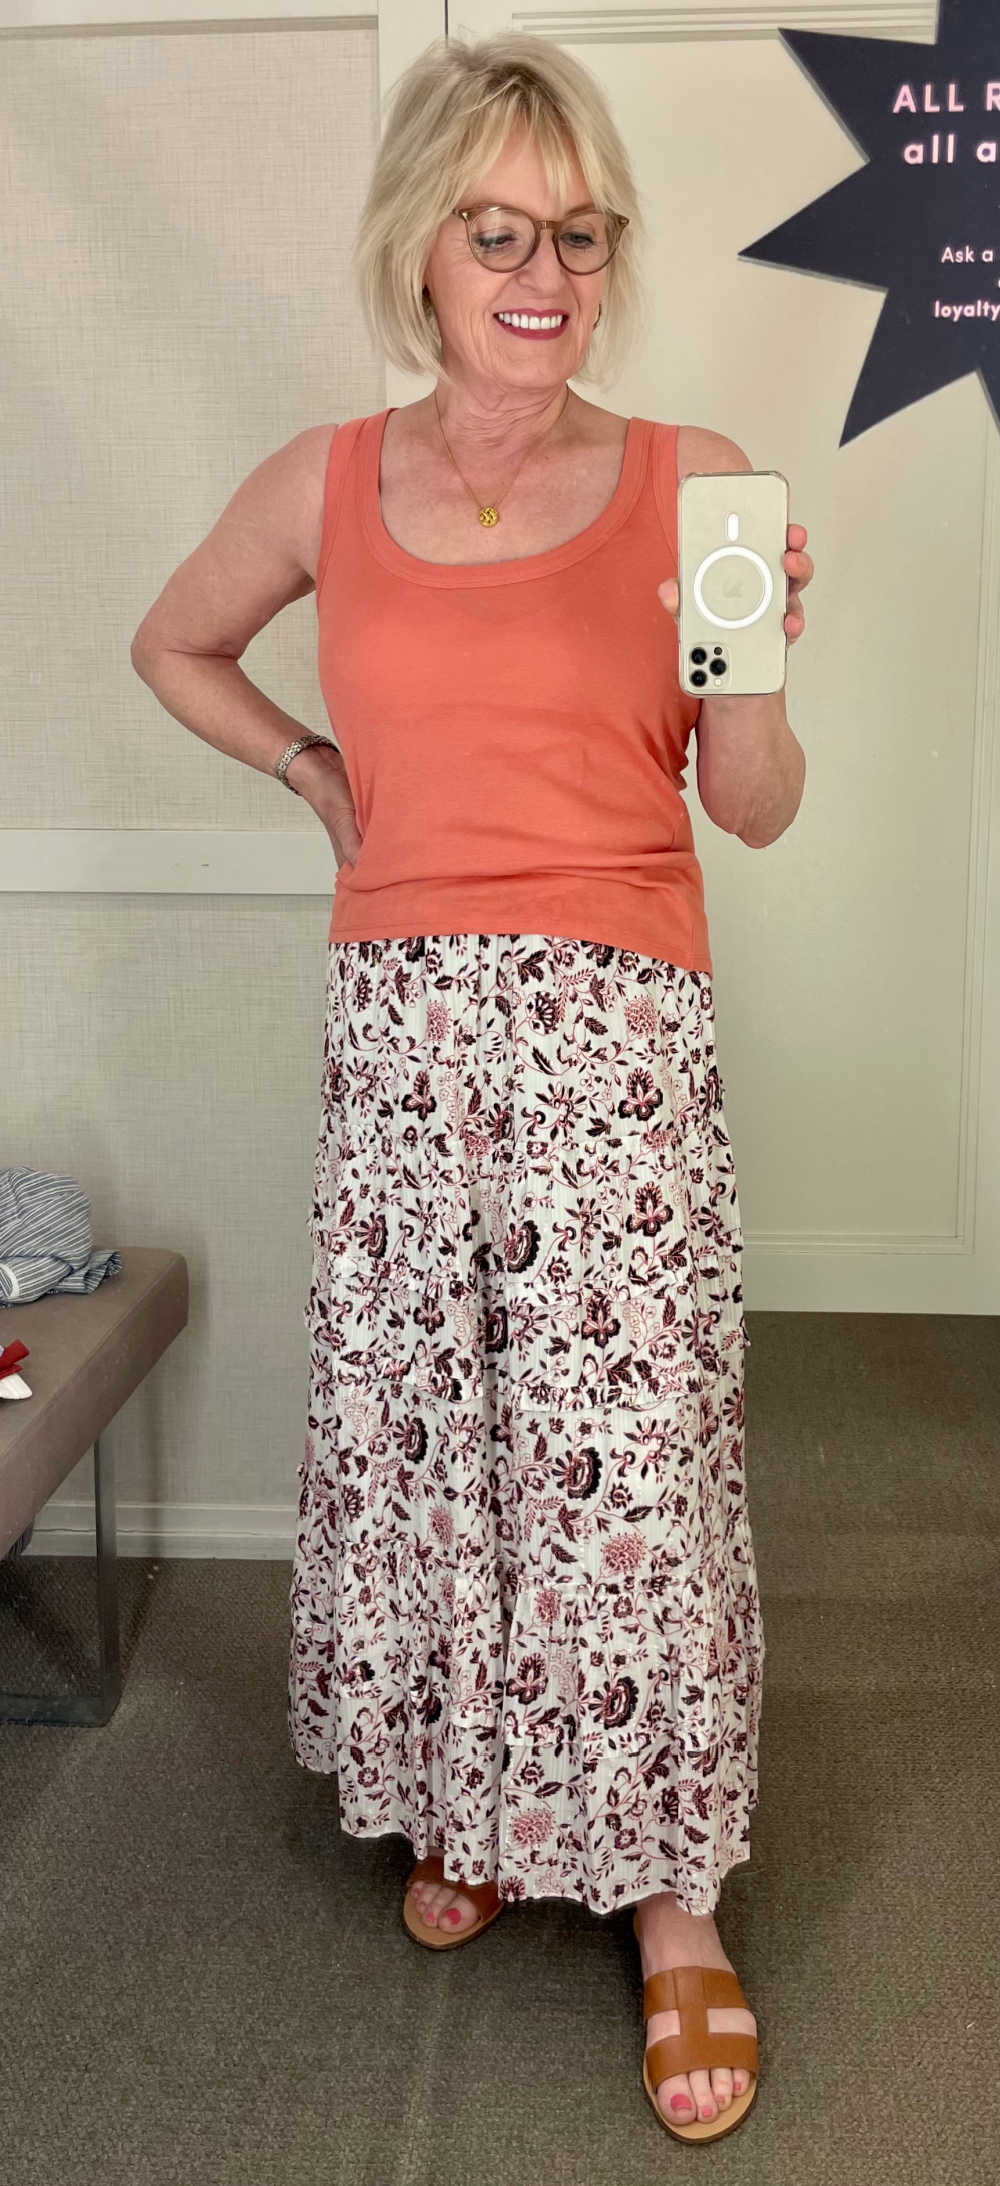 woman wearing orange tank and skirt in loft dressing room